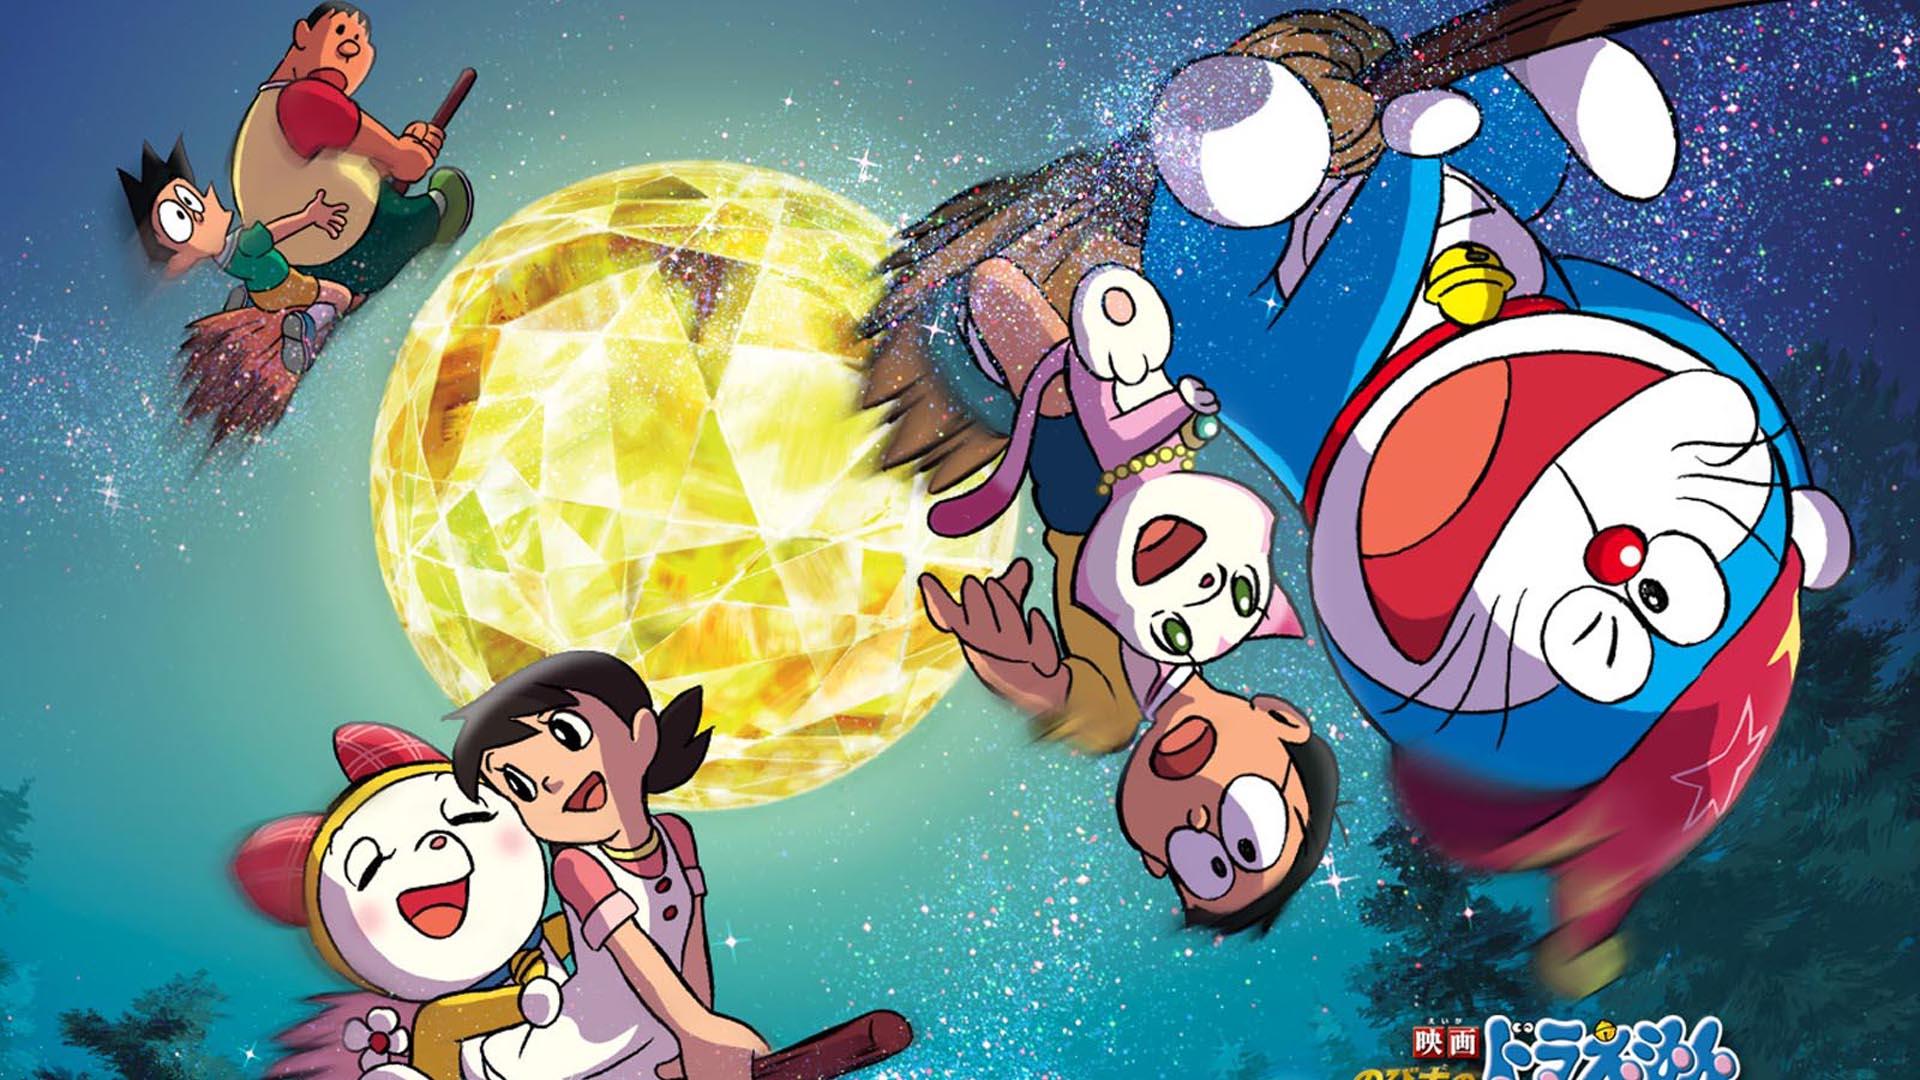 Wallpapers Doraemon - Wallpaper Cave